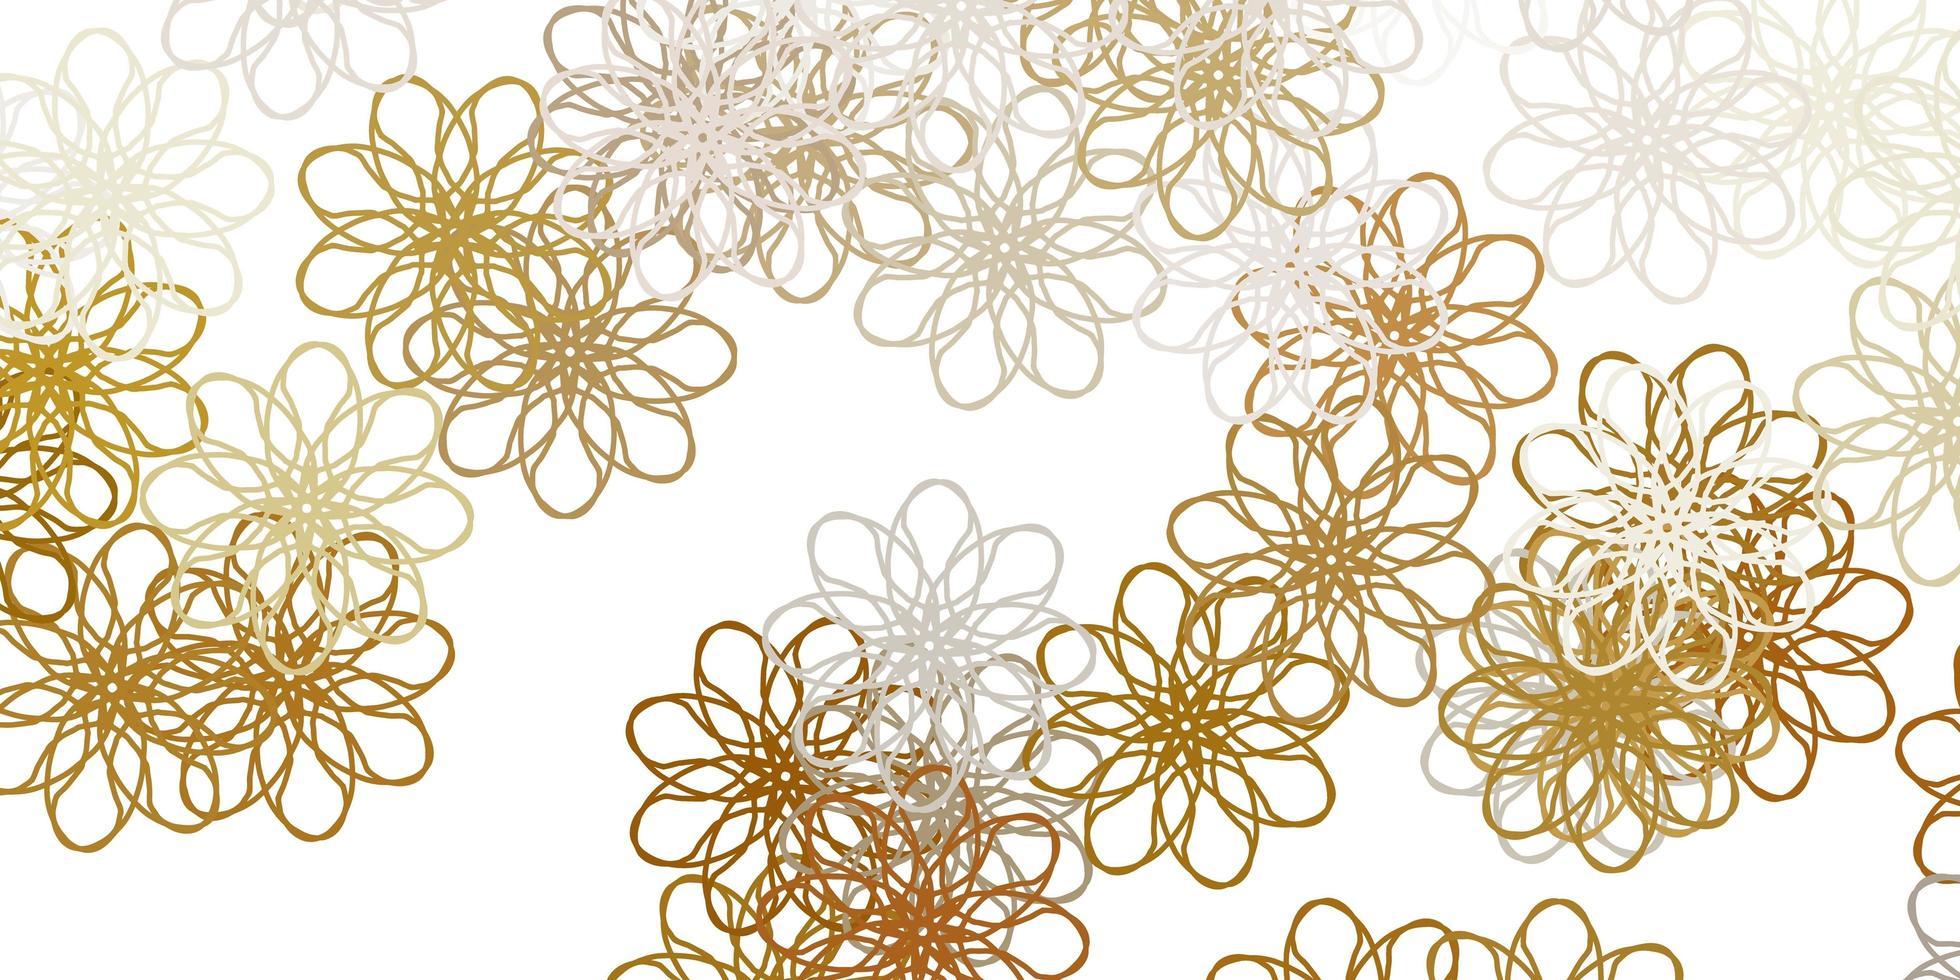 hellgraues Vektor-Gekritzelmuster mit Blumen. vektor